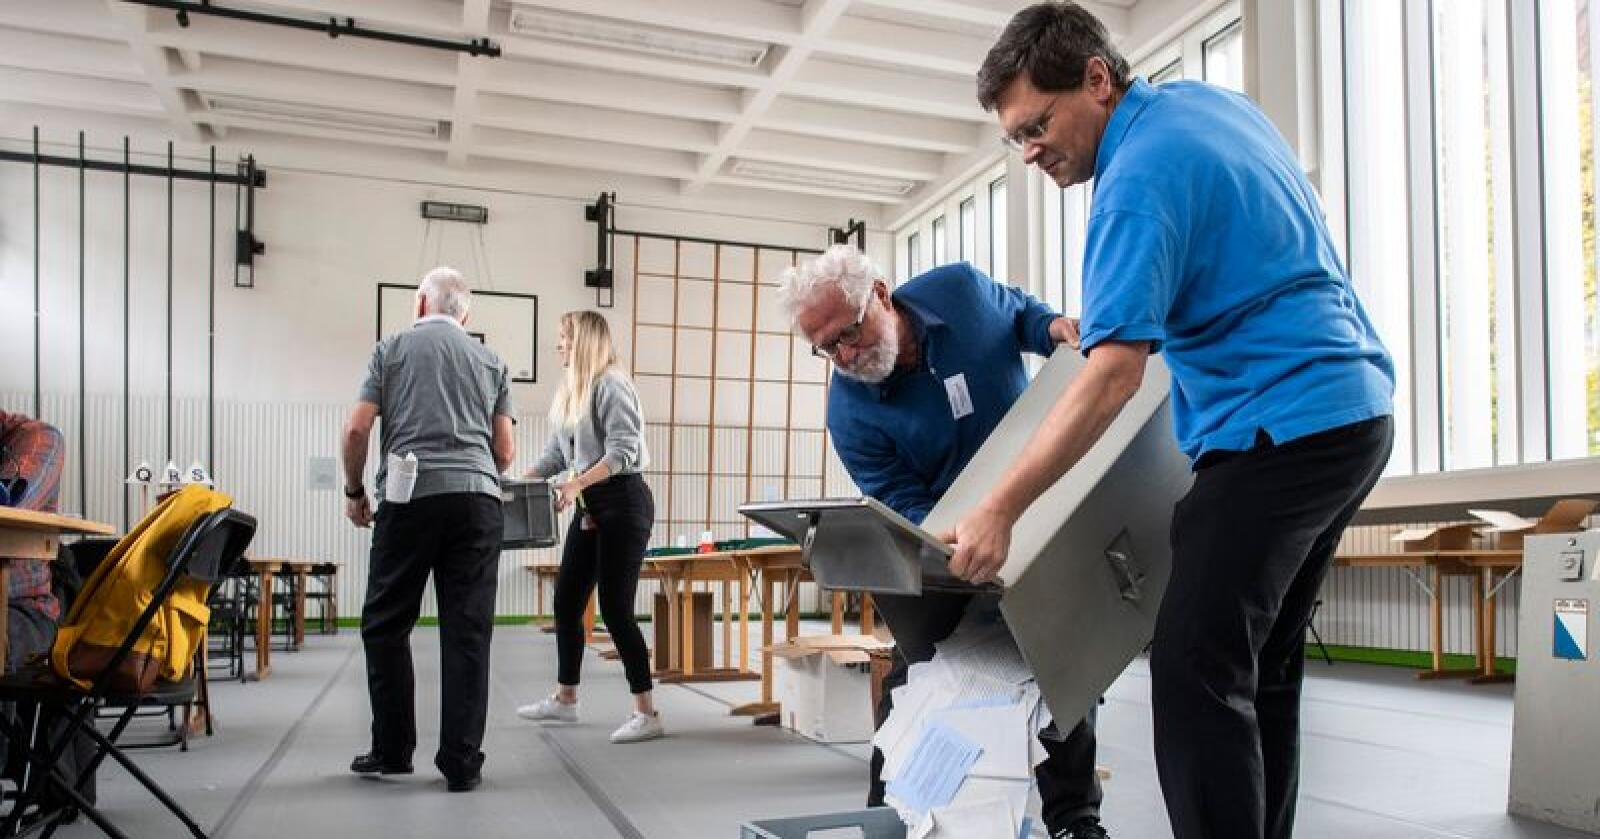 En stemmeurne tømmes i et valglokale i Zurich i Sveits søndag. Foto: Ennio Leanza / AP / NTB scanpix.